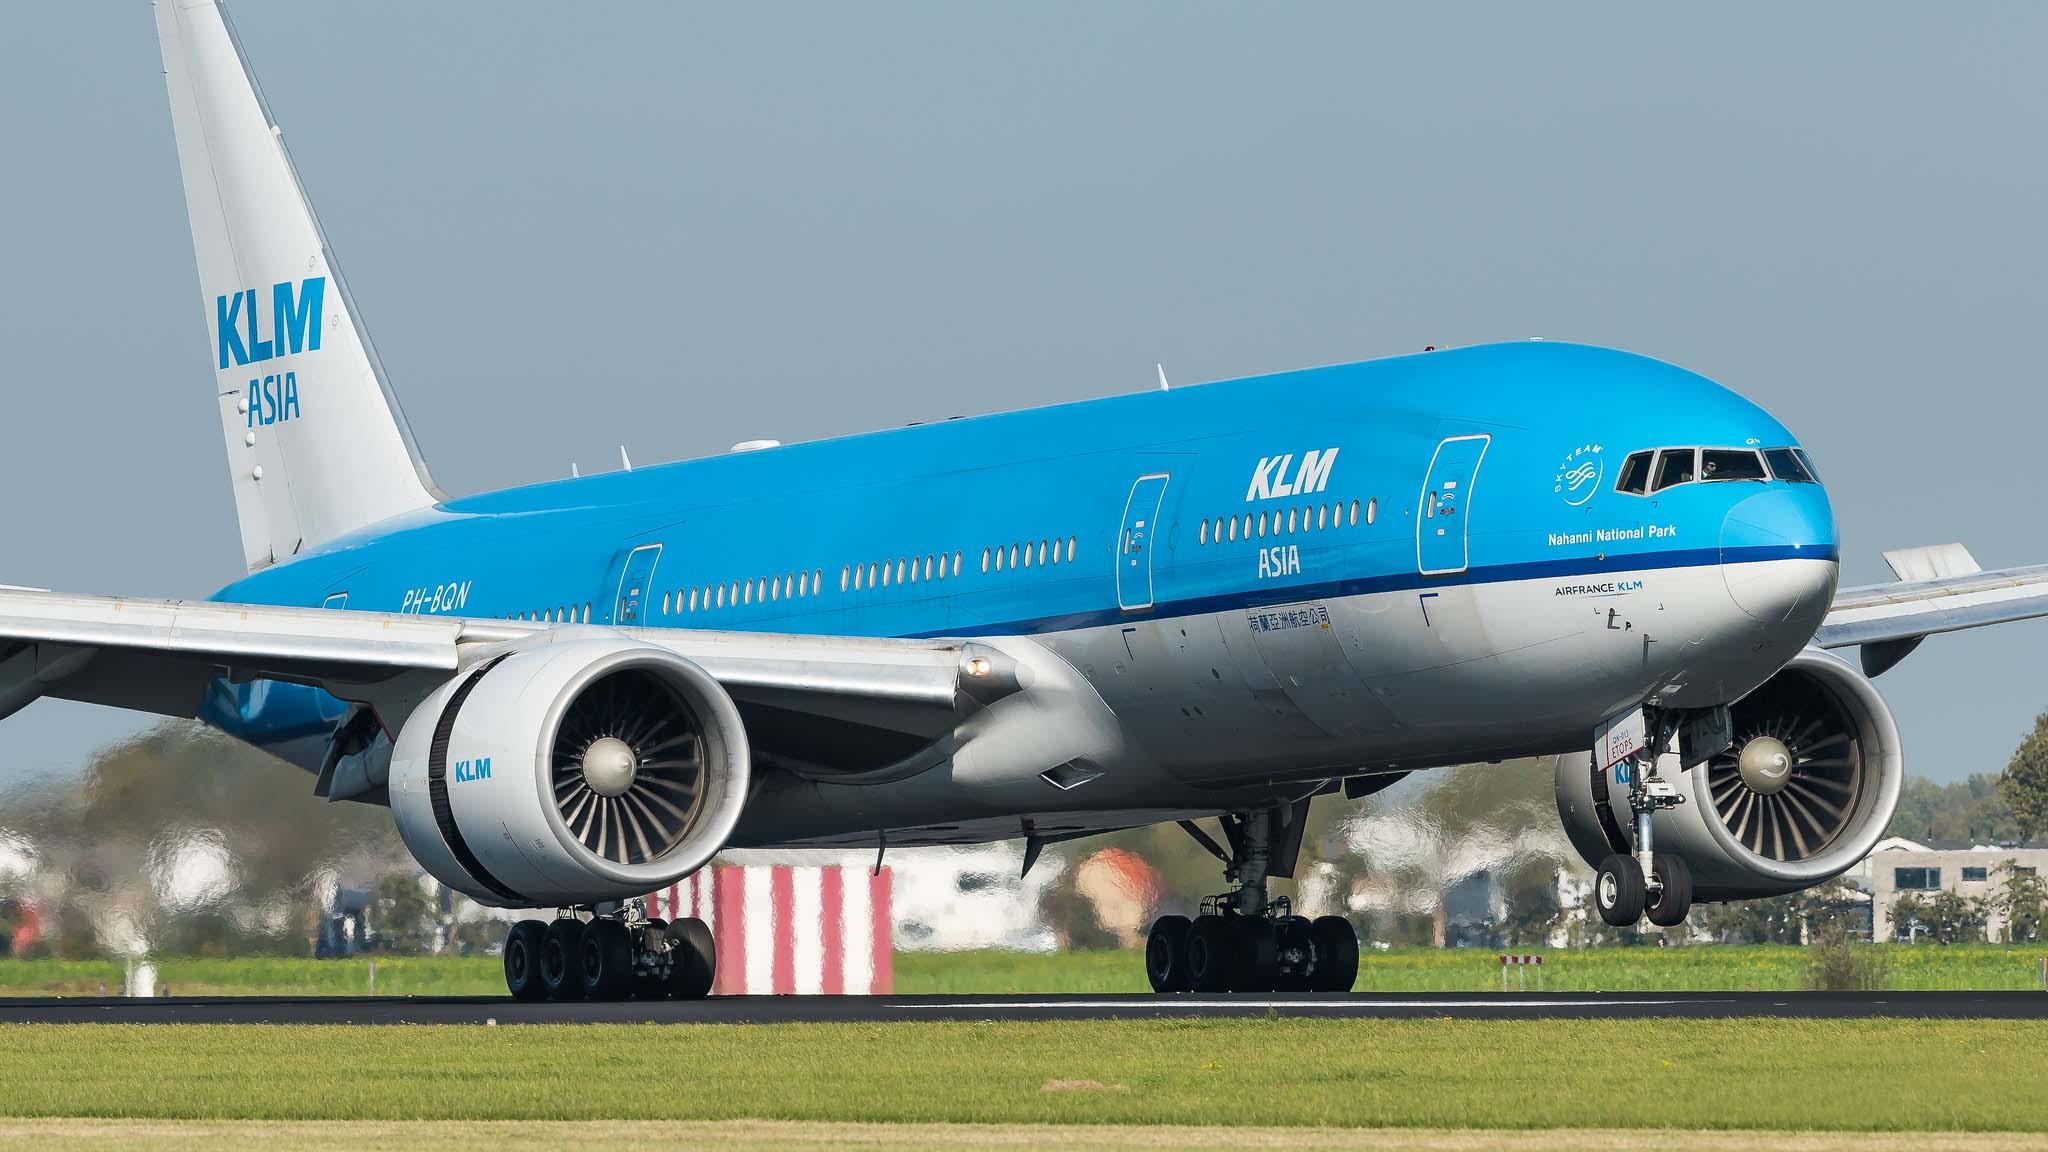 Boeing 777-206(ER) KLM Asia PH-BQN